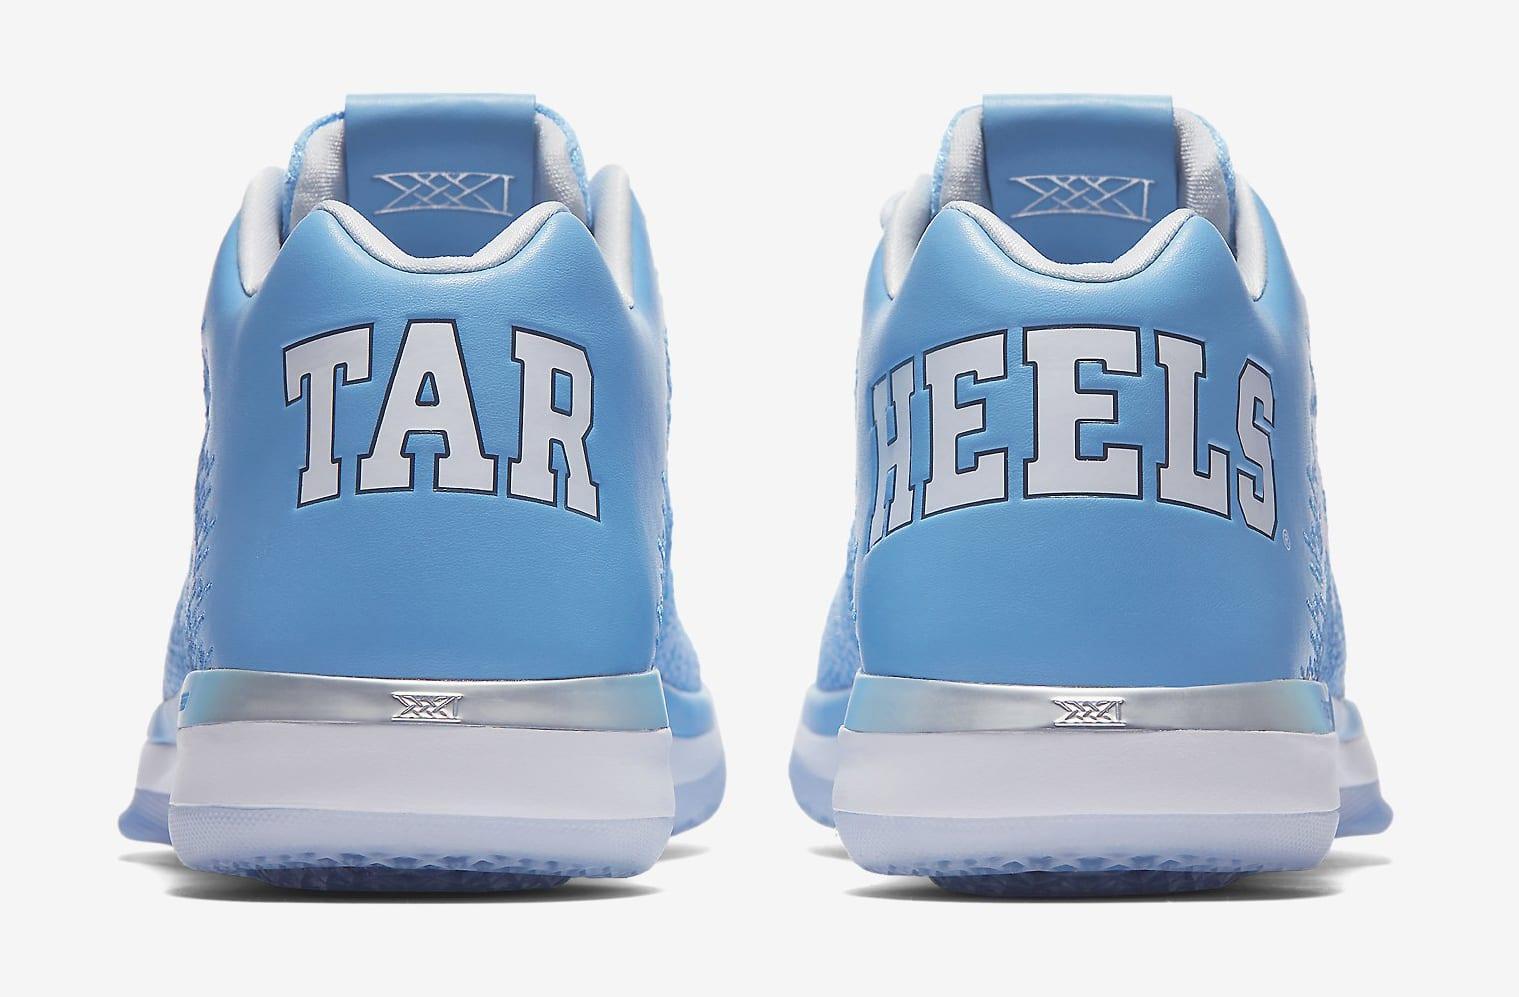 UNC Air Jordan 31 Heel